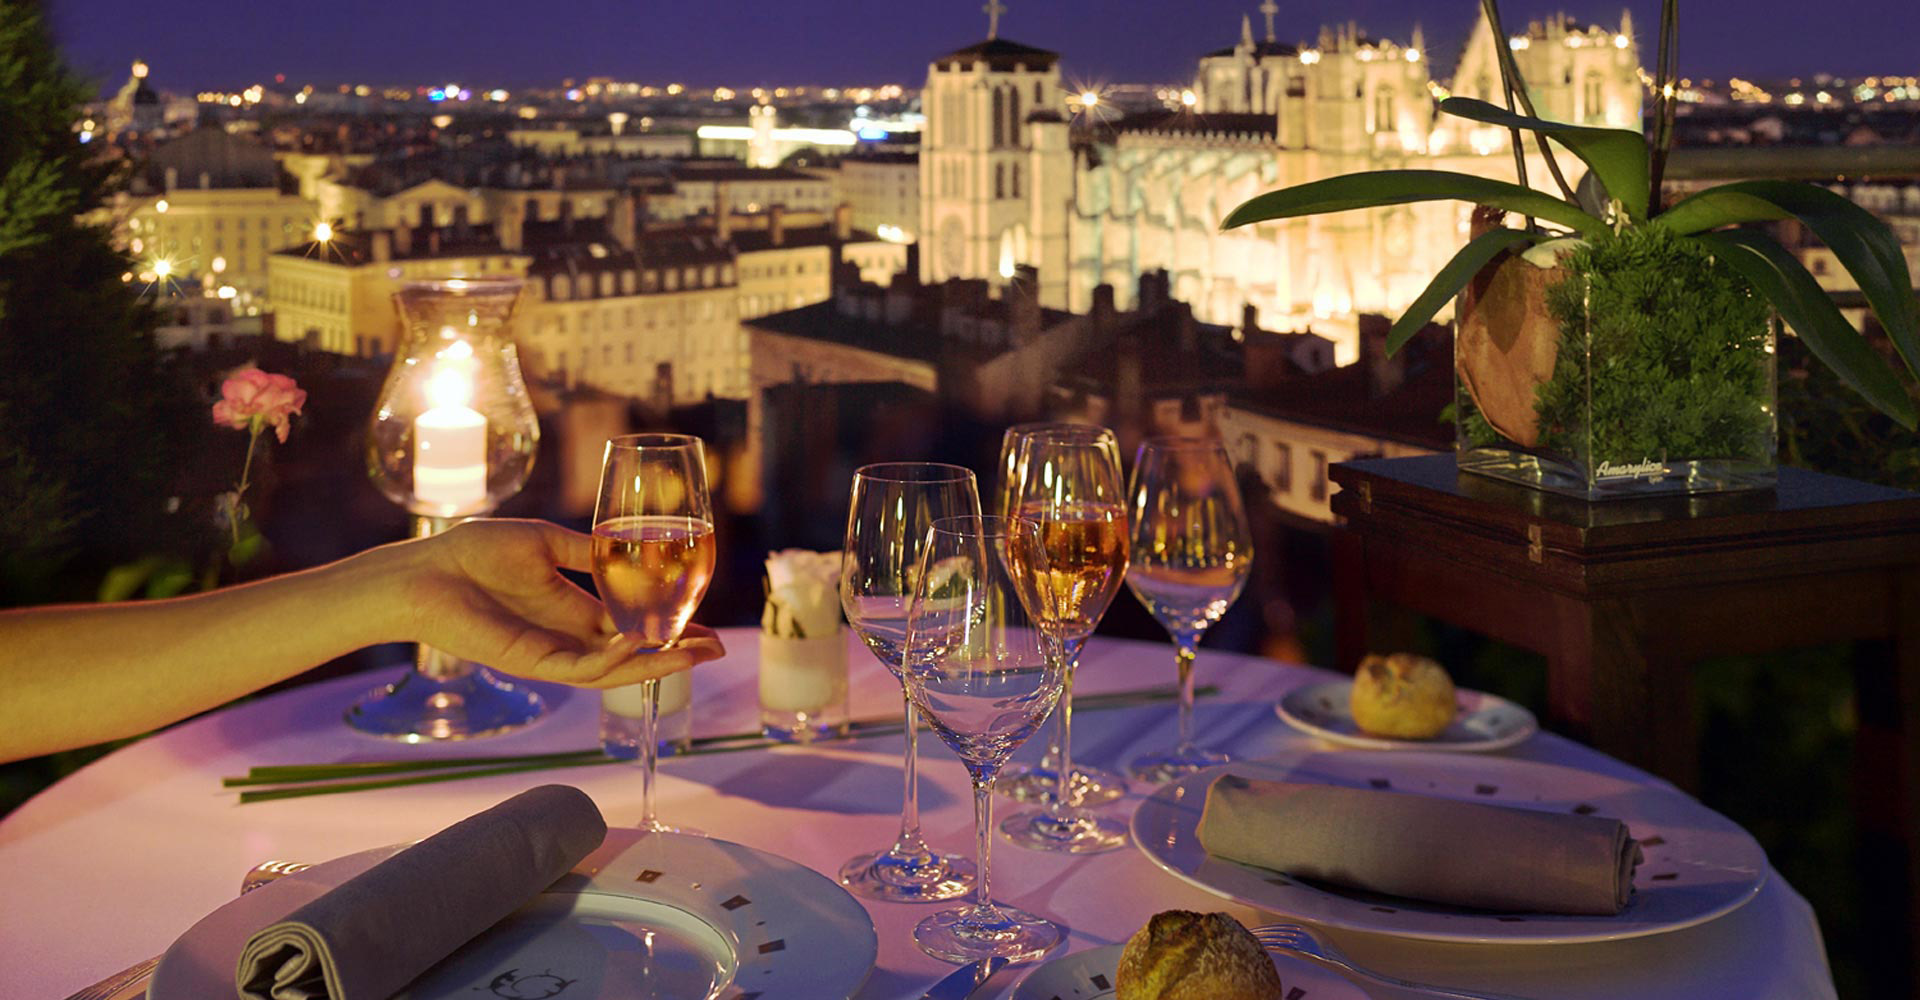 lyon-resto-restaurant-adresse-food-drink-gastronomique-repas-dîner-top-meilleur